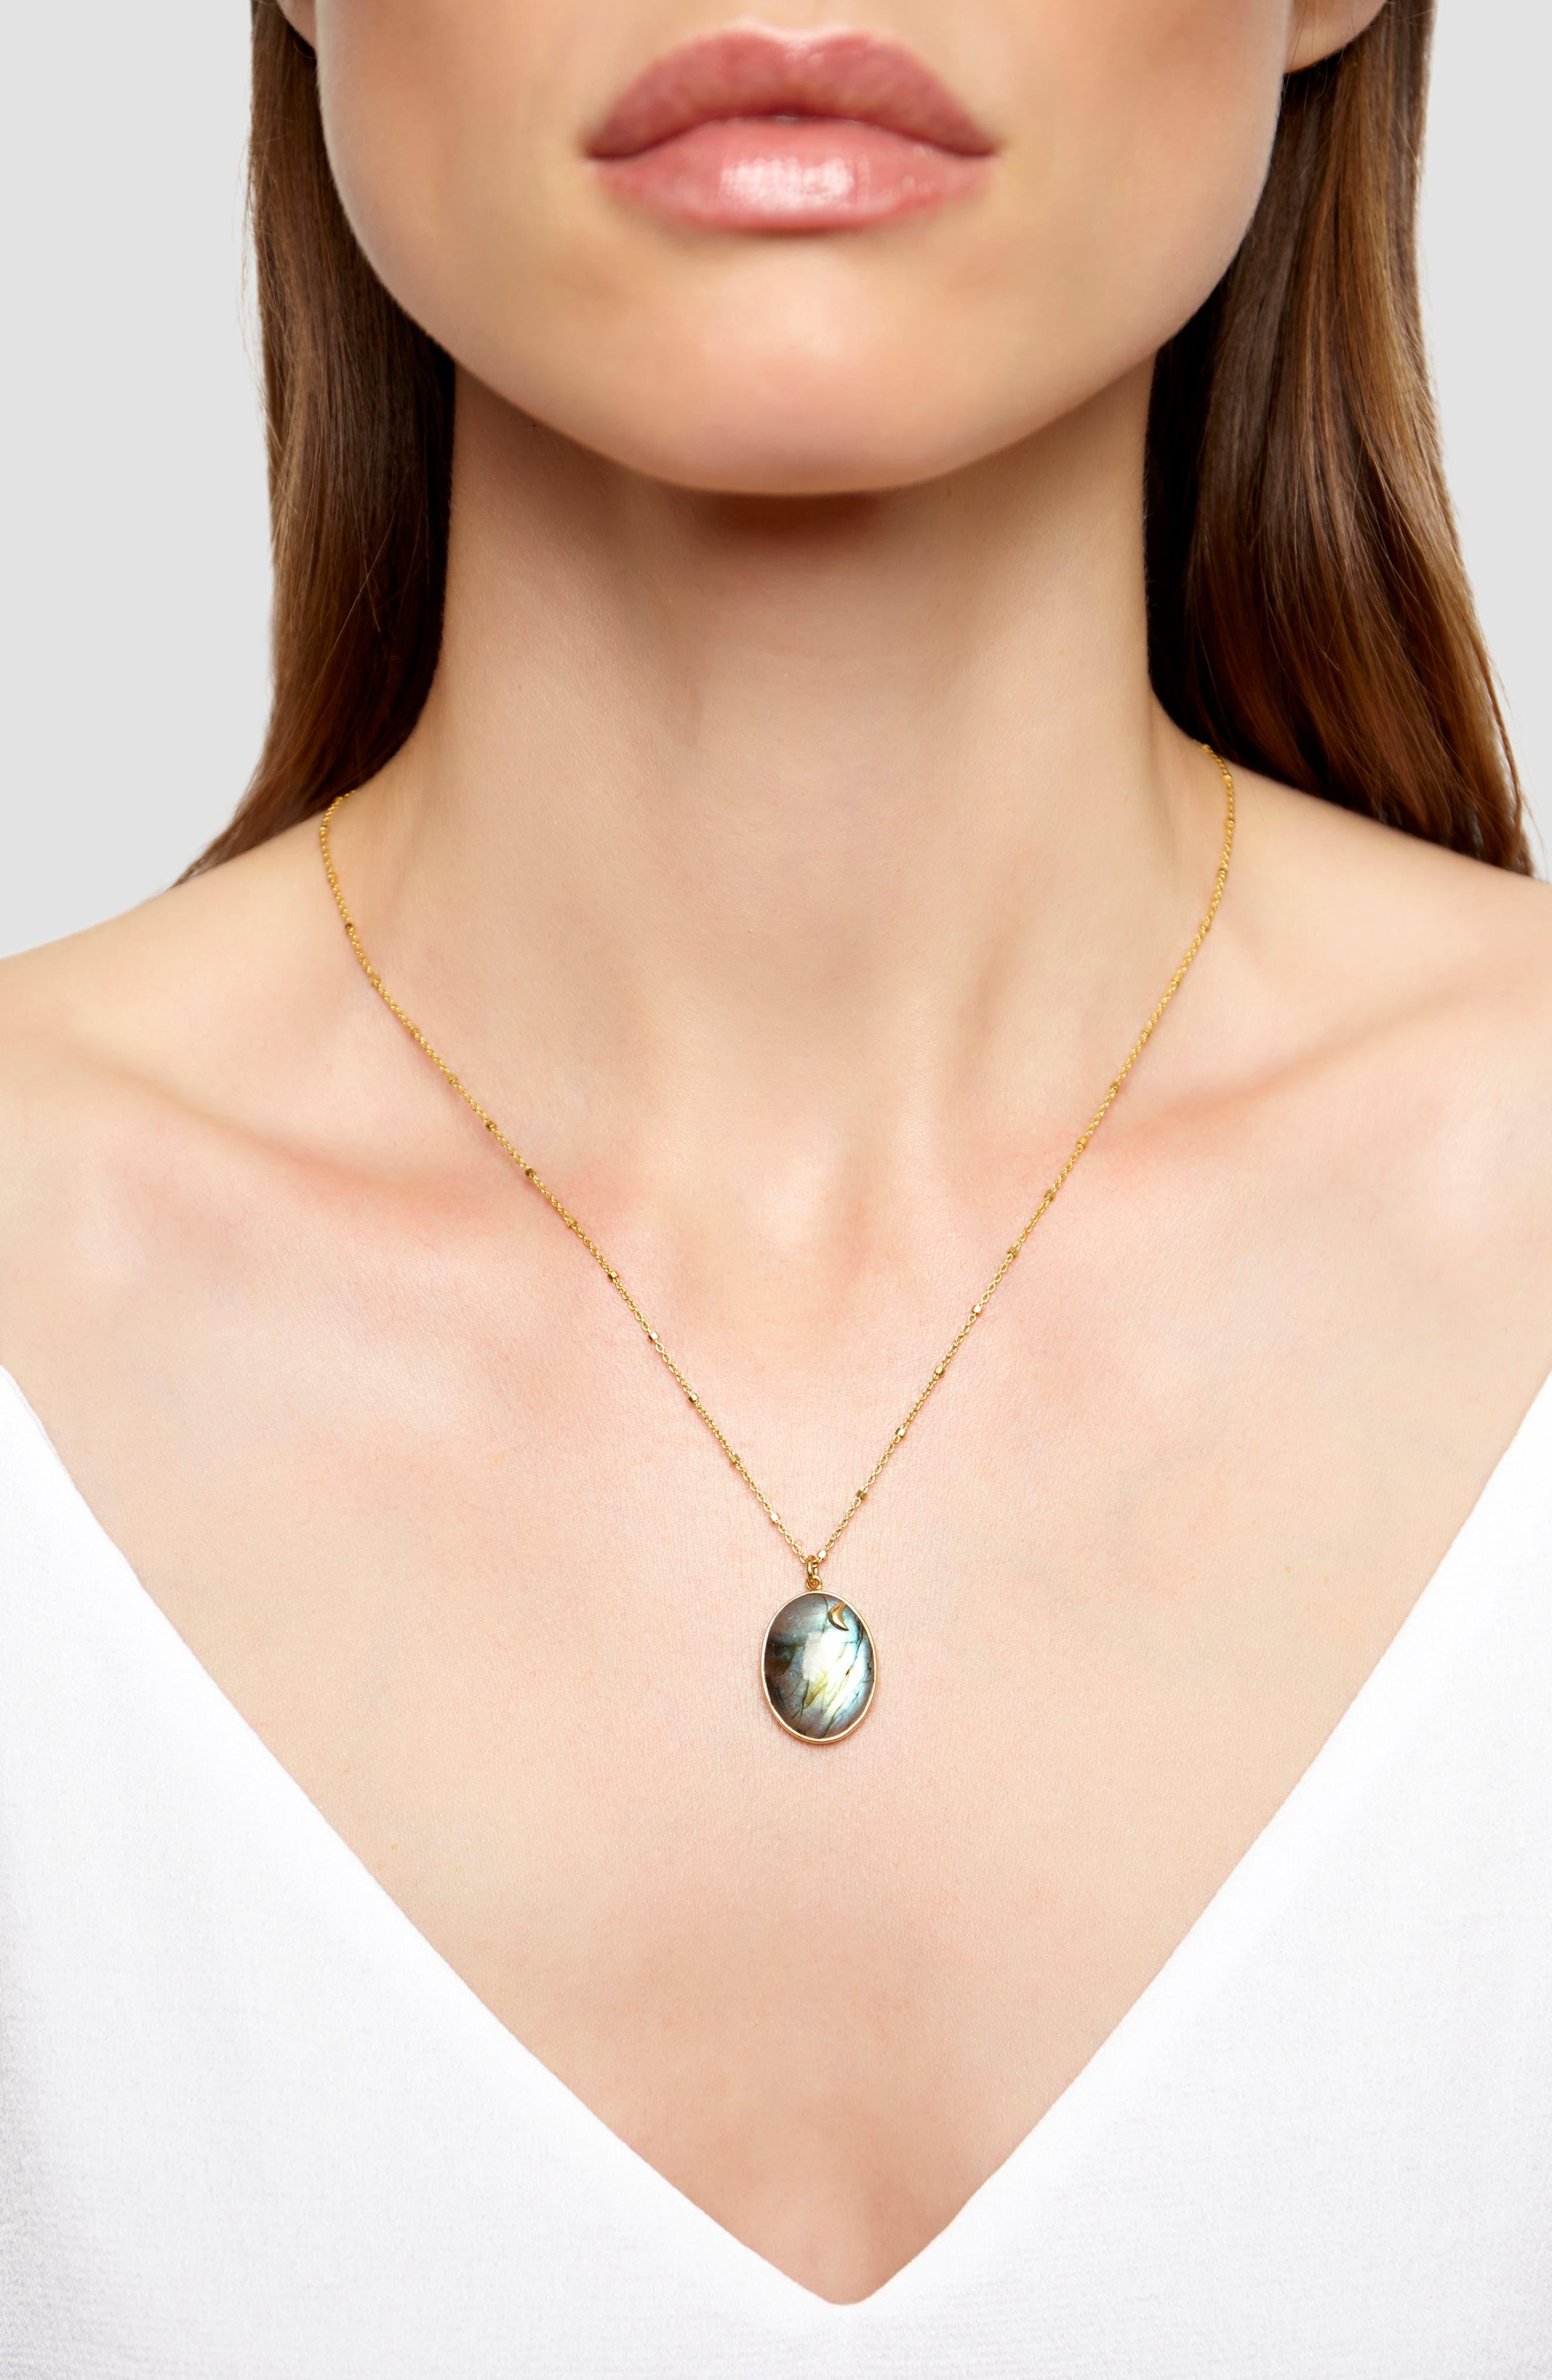 ARGENTO VIVO,                             Moon Labradorite Pendant Necklace,                             Alternate thumbnail 2, color,                             710